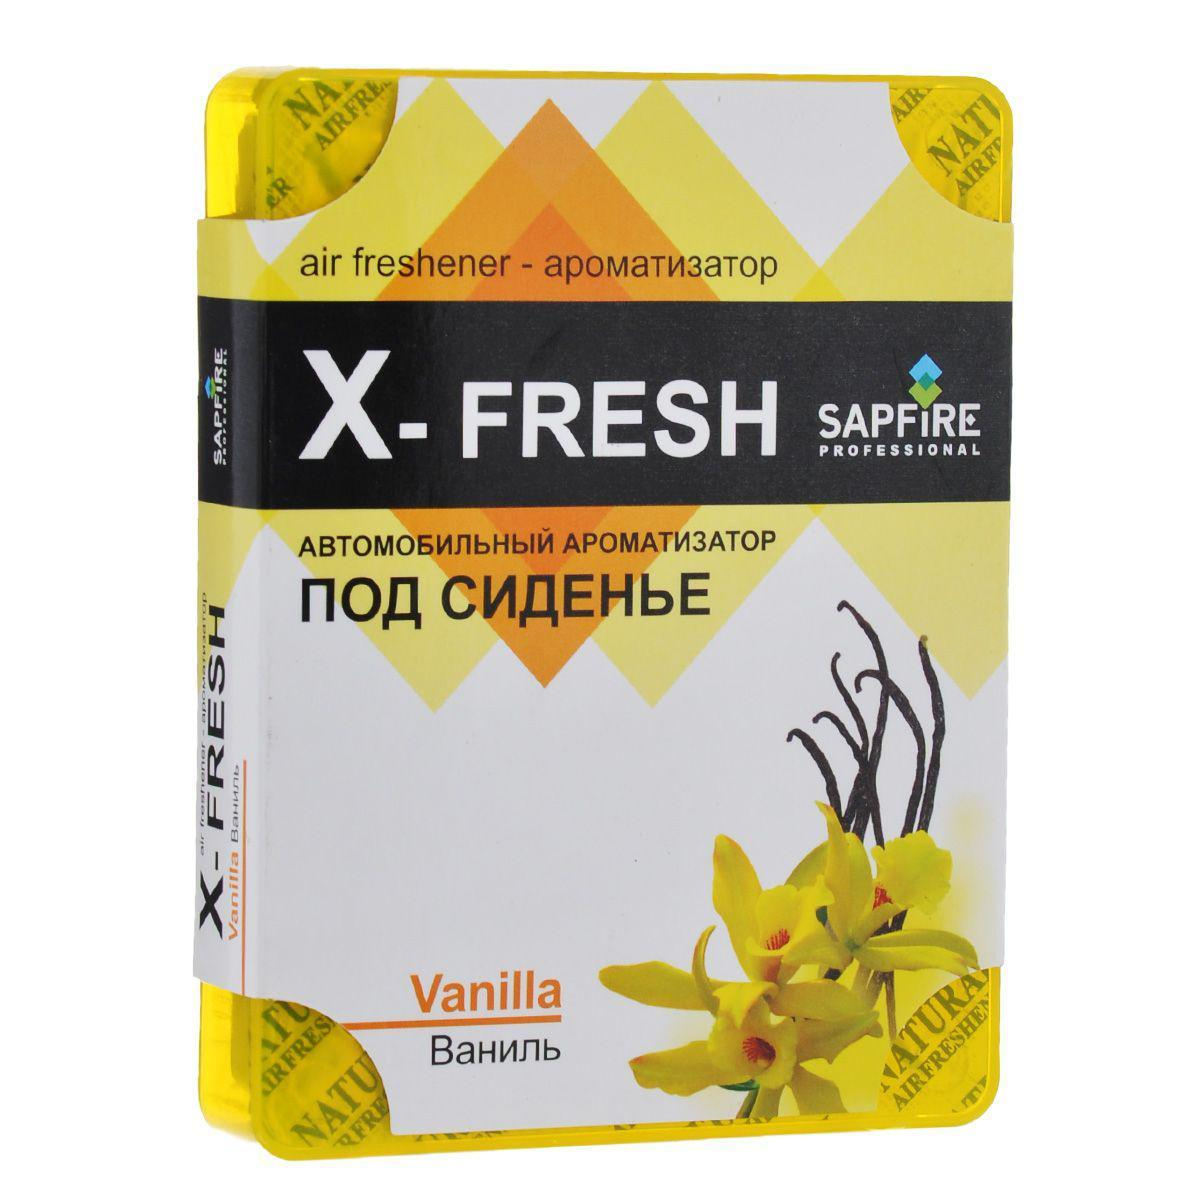 Ароматизатор под сиденье автомобиля Sapfire X-Fresh, ваниль